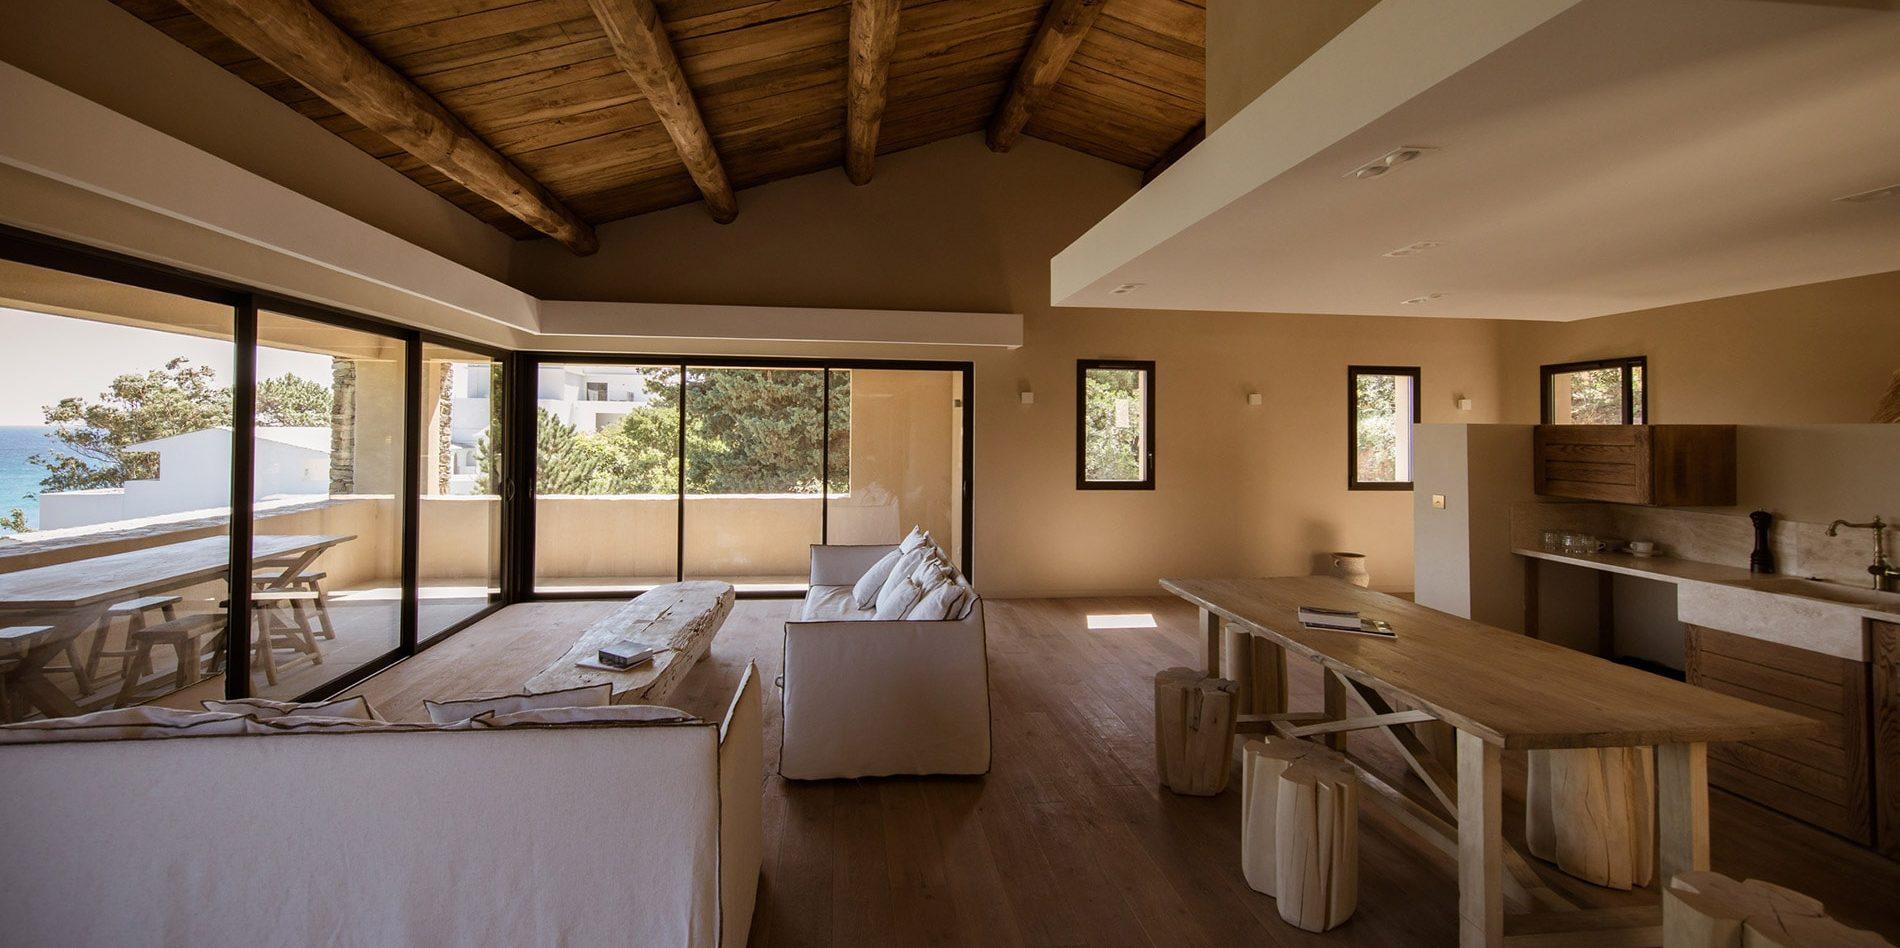 Hotel Misincu Cagnano Cap Corse Corsica Frankrijk villa living keuken loggia terras zeezicht